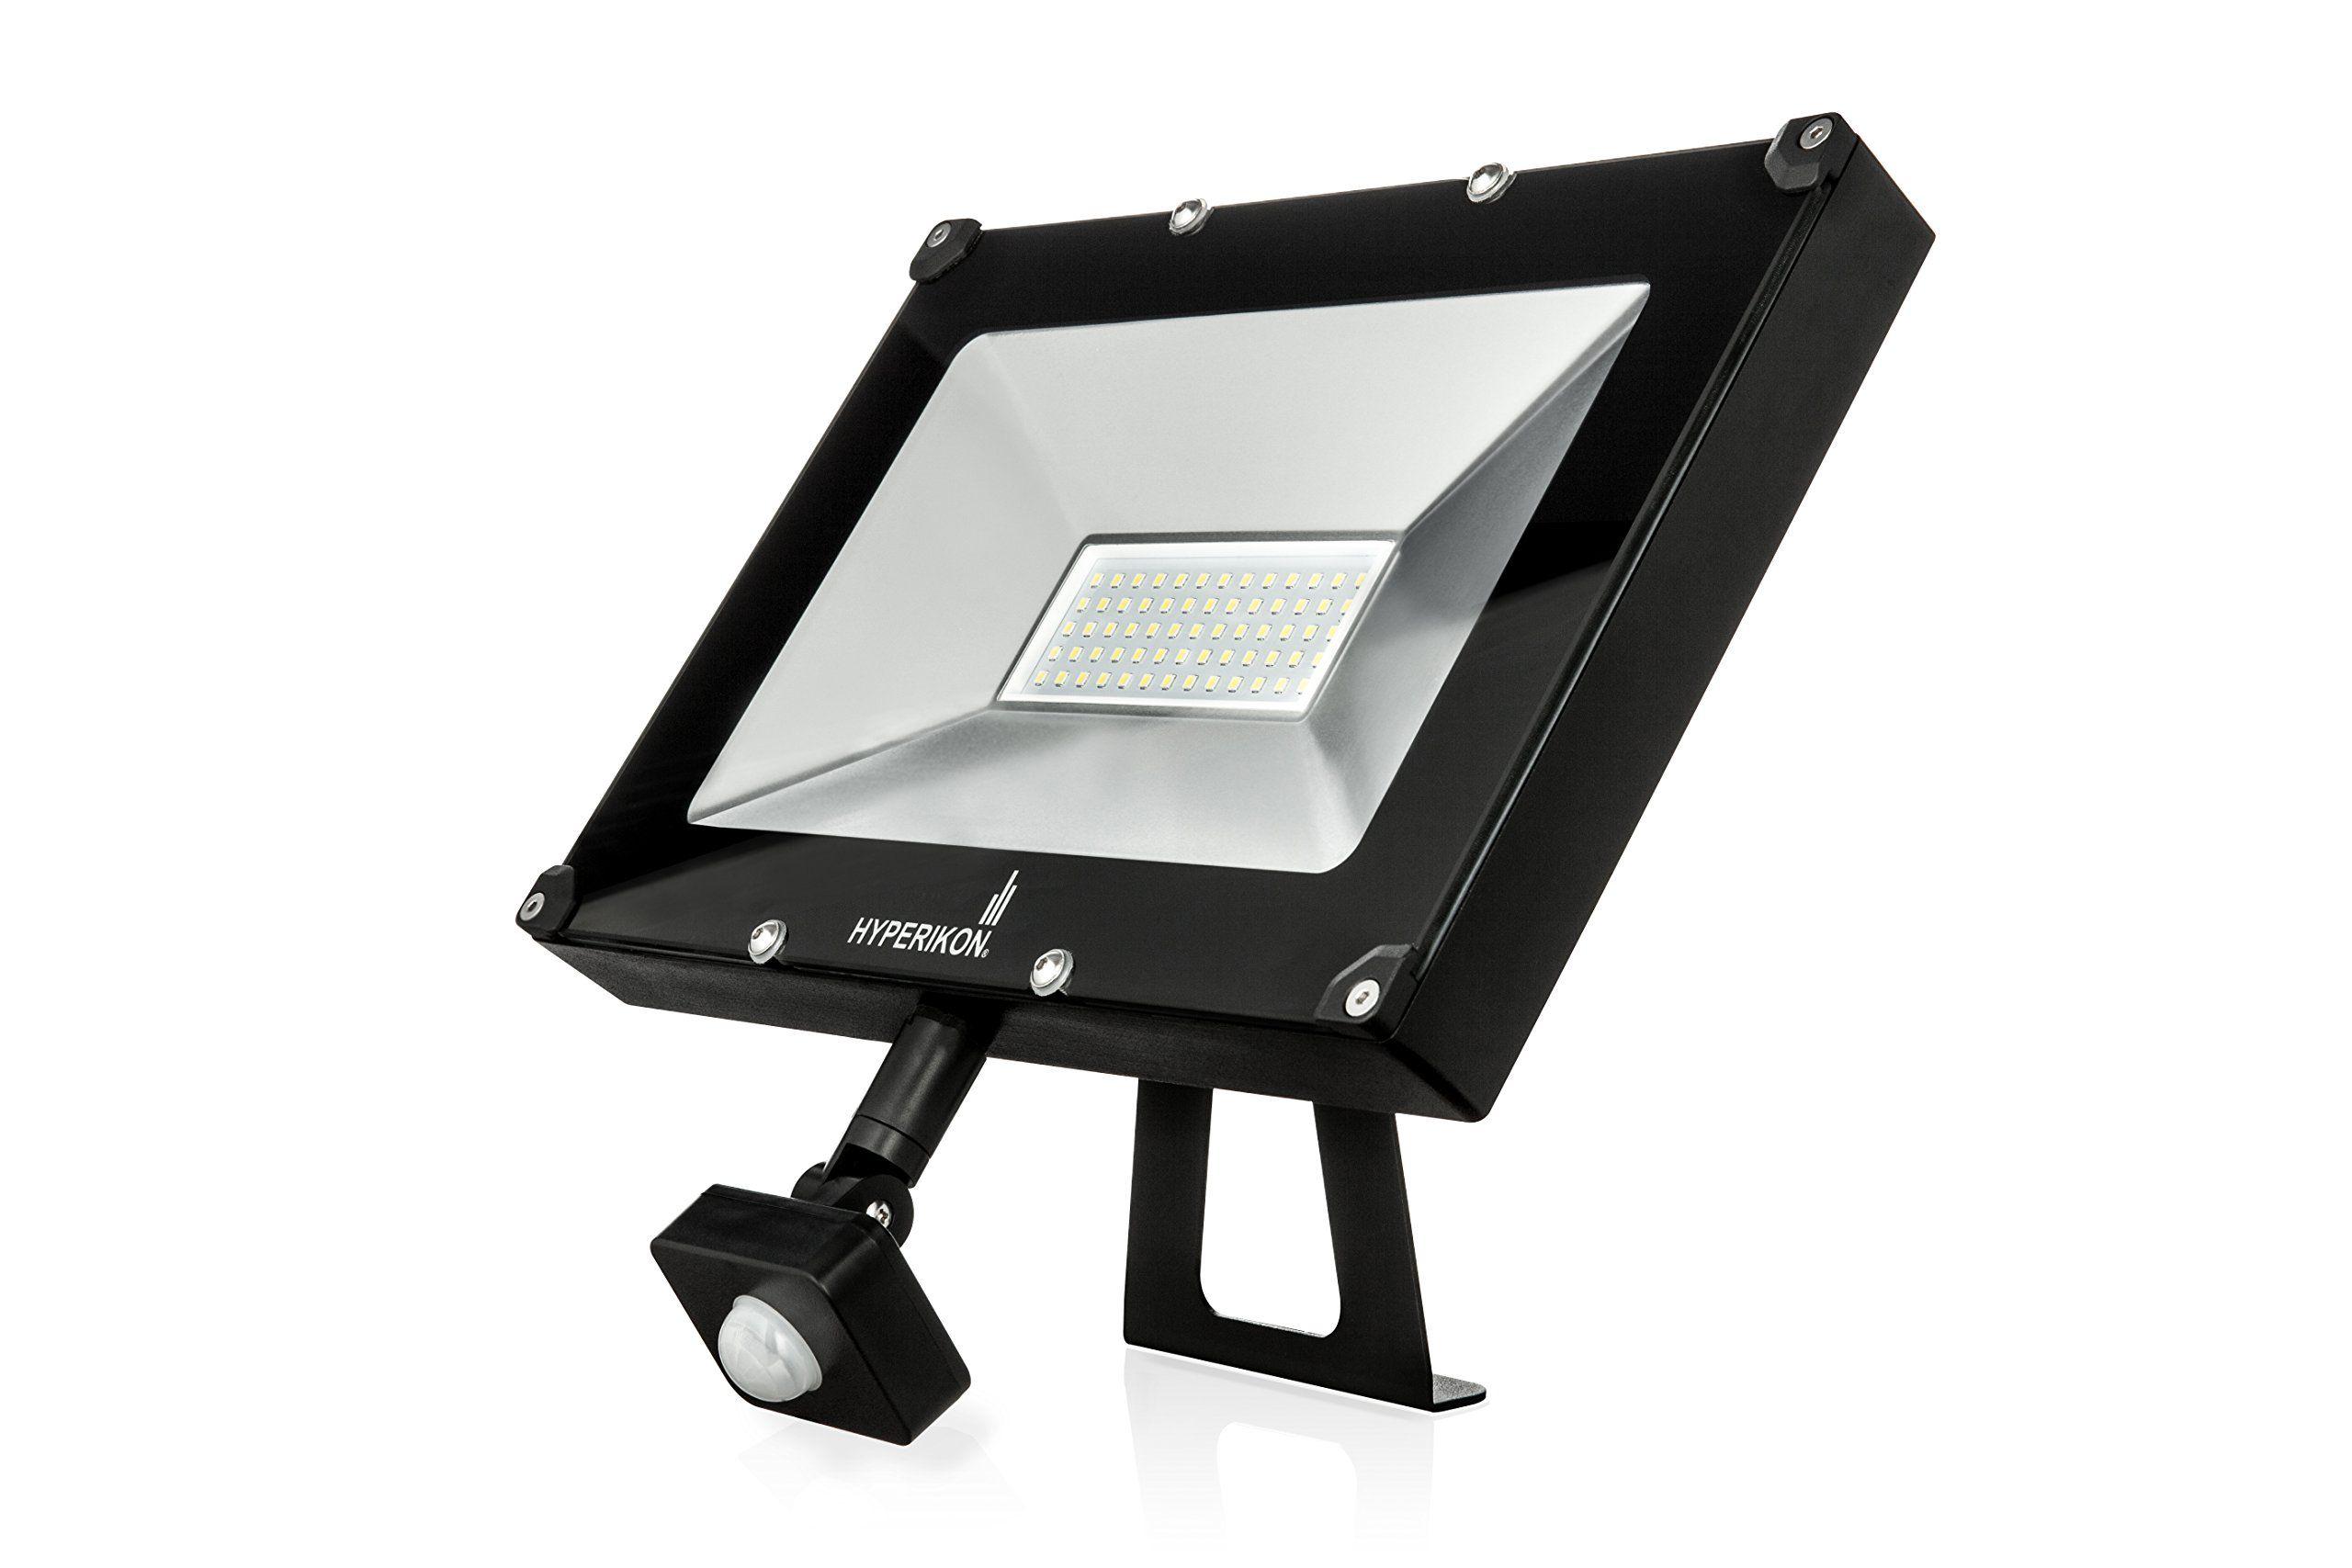 res lumens watt ac lights light high lighting flood intensity led image leds hi outdoor p